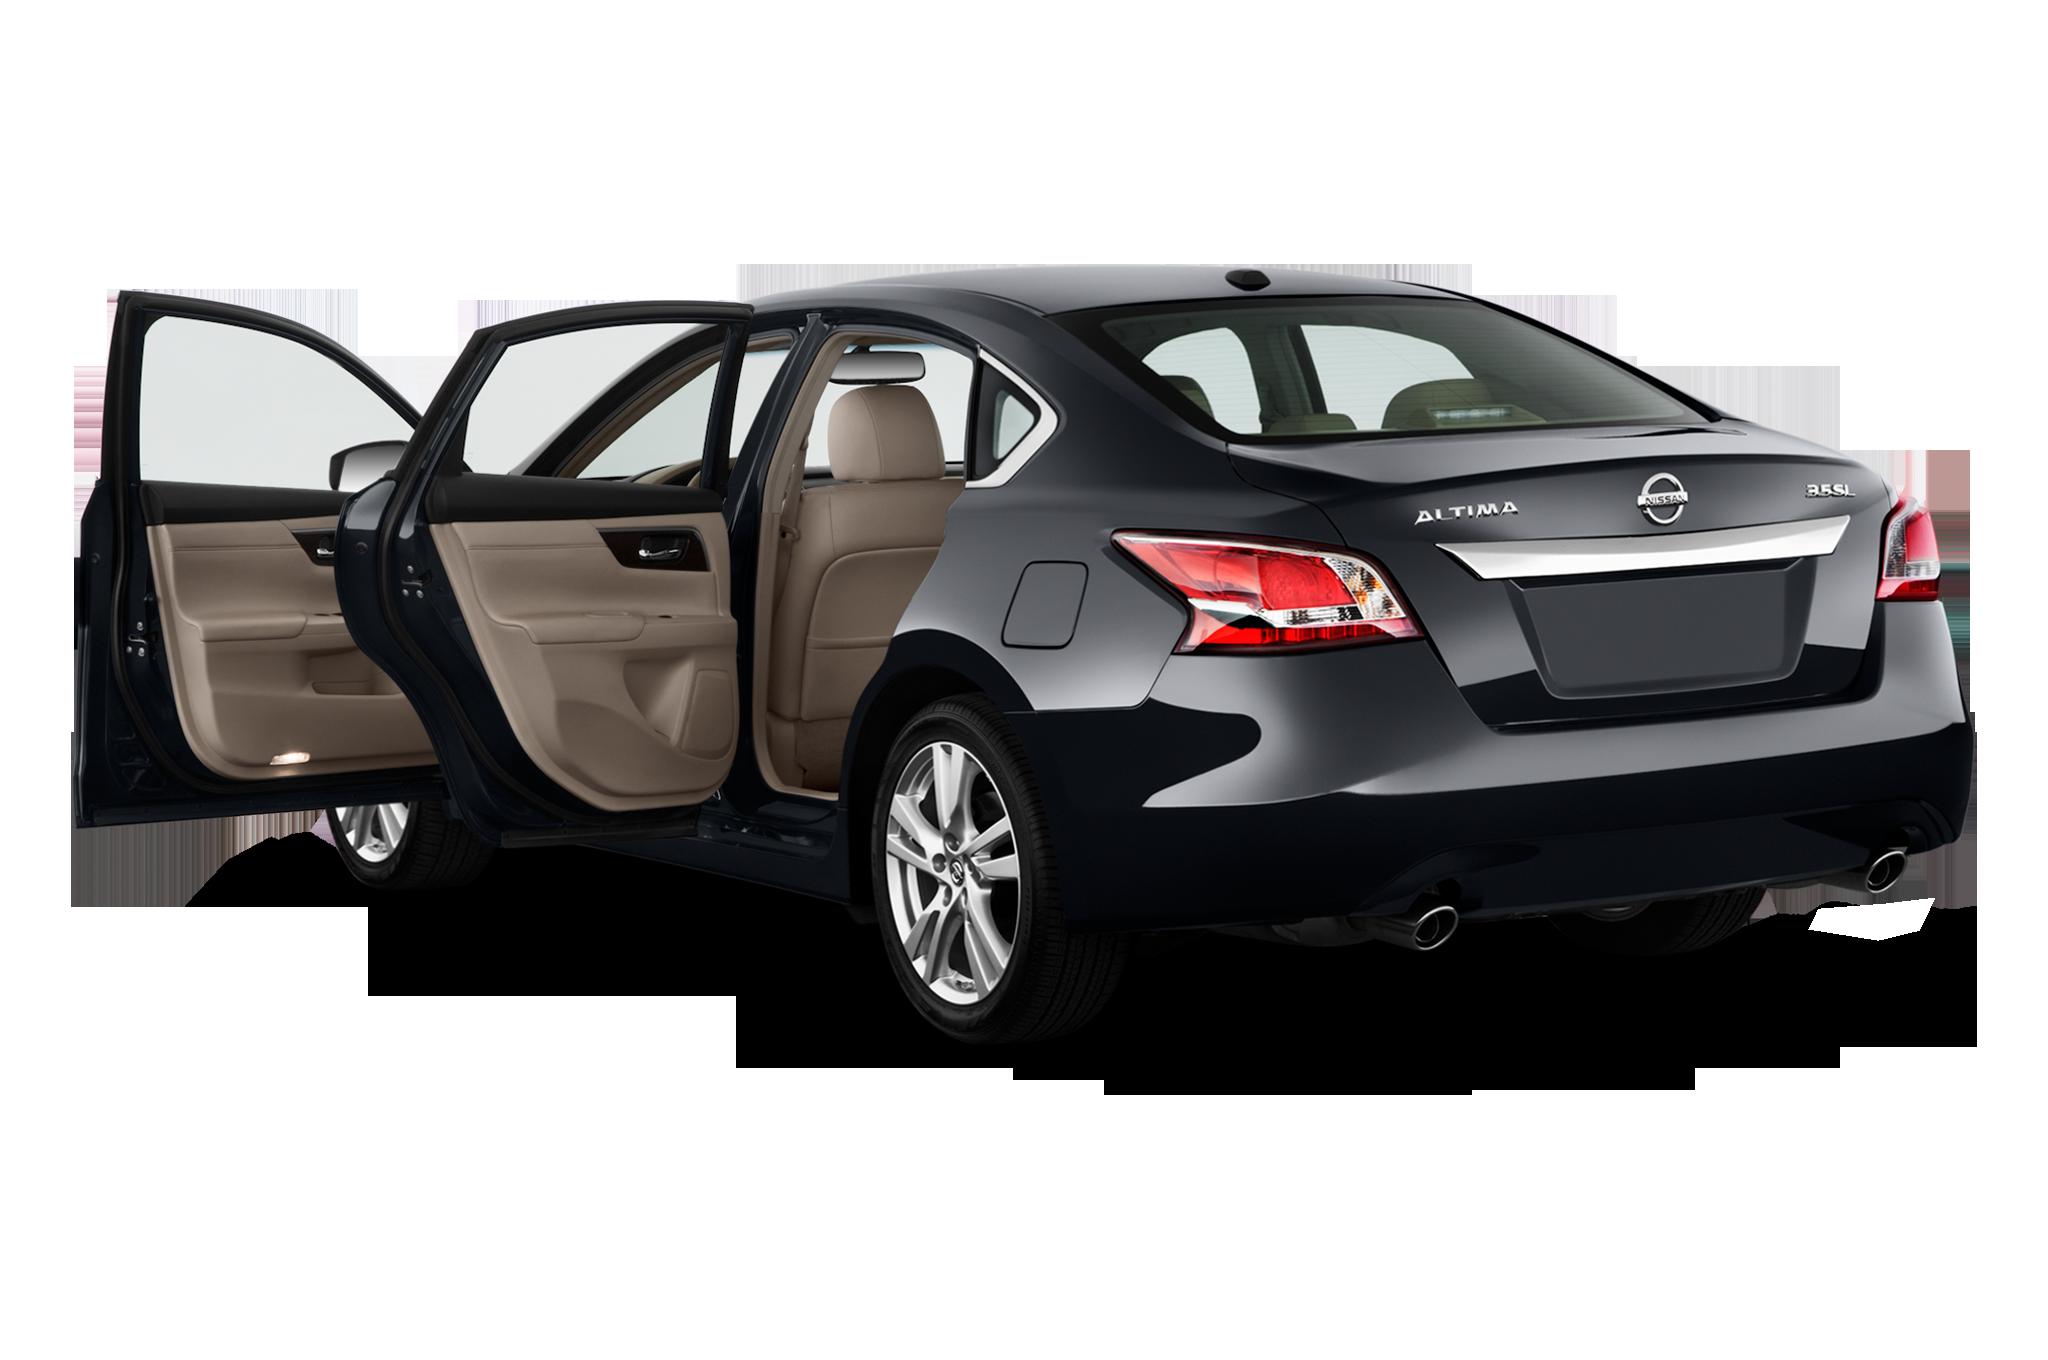 2014 Nissan Altima 2.5 SL: Around the Block - Automobile ...